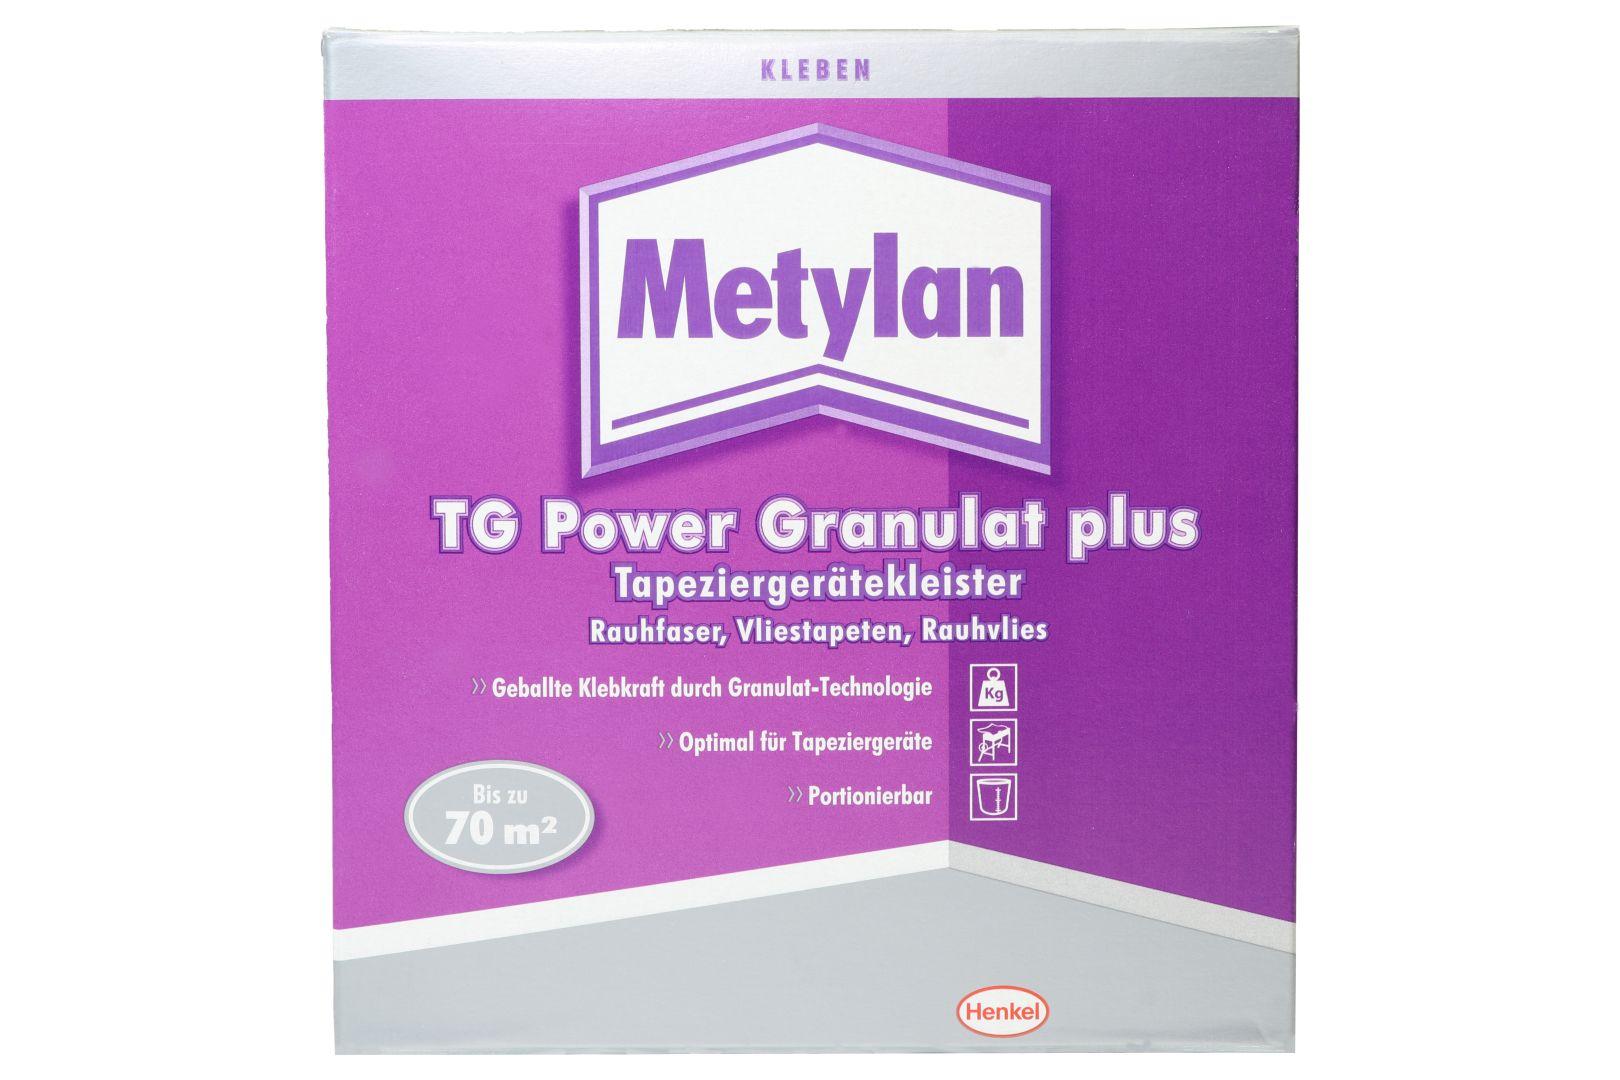 Metylan TG Power Granulat plus, Tapeziergerätekleister, Ausbeute ca. 70 m², 500 g